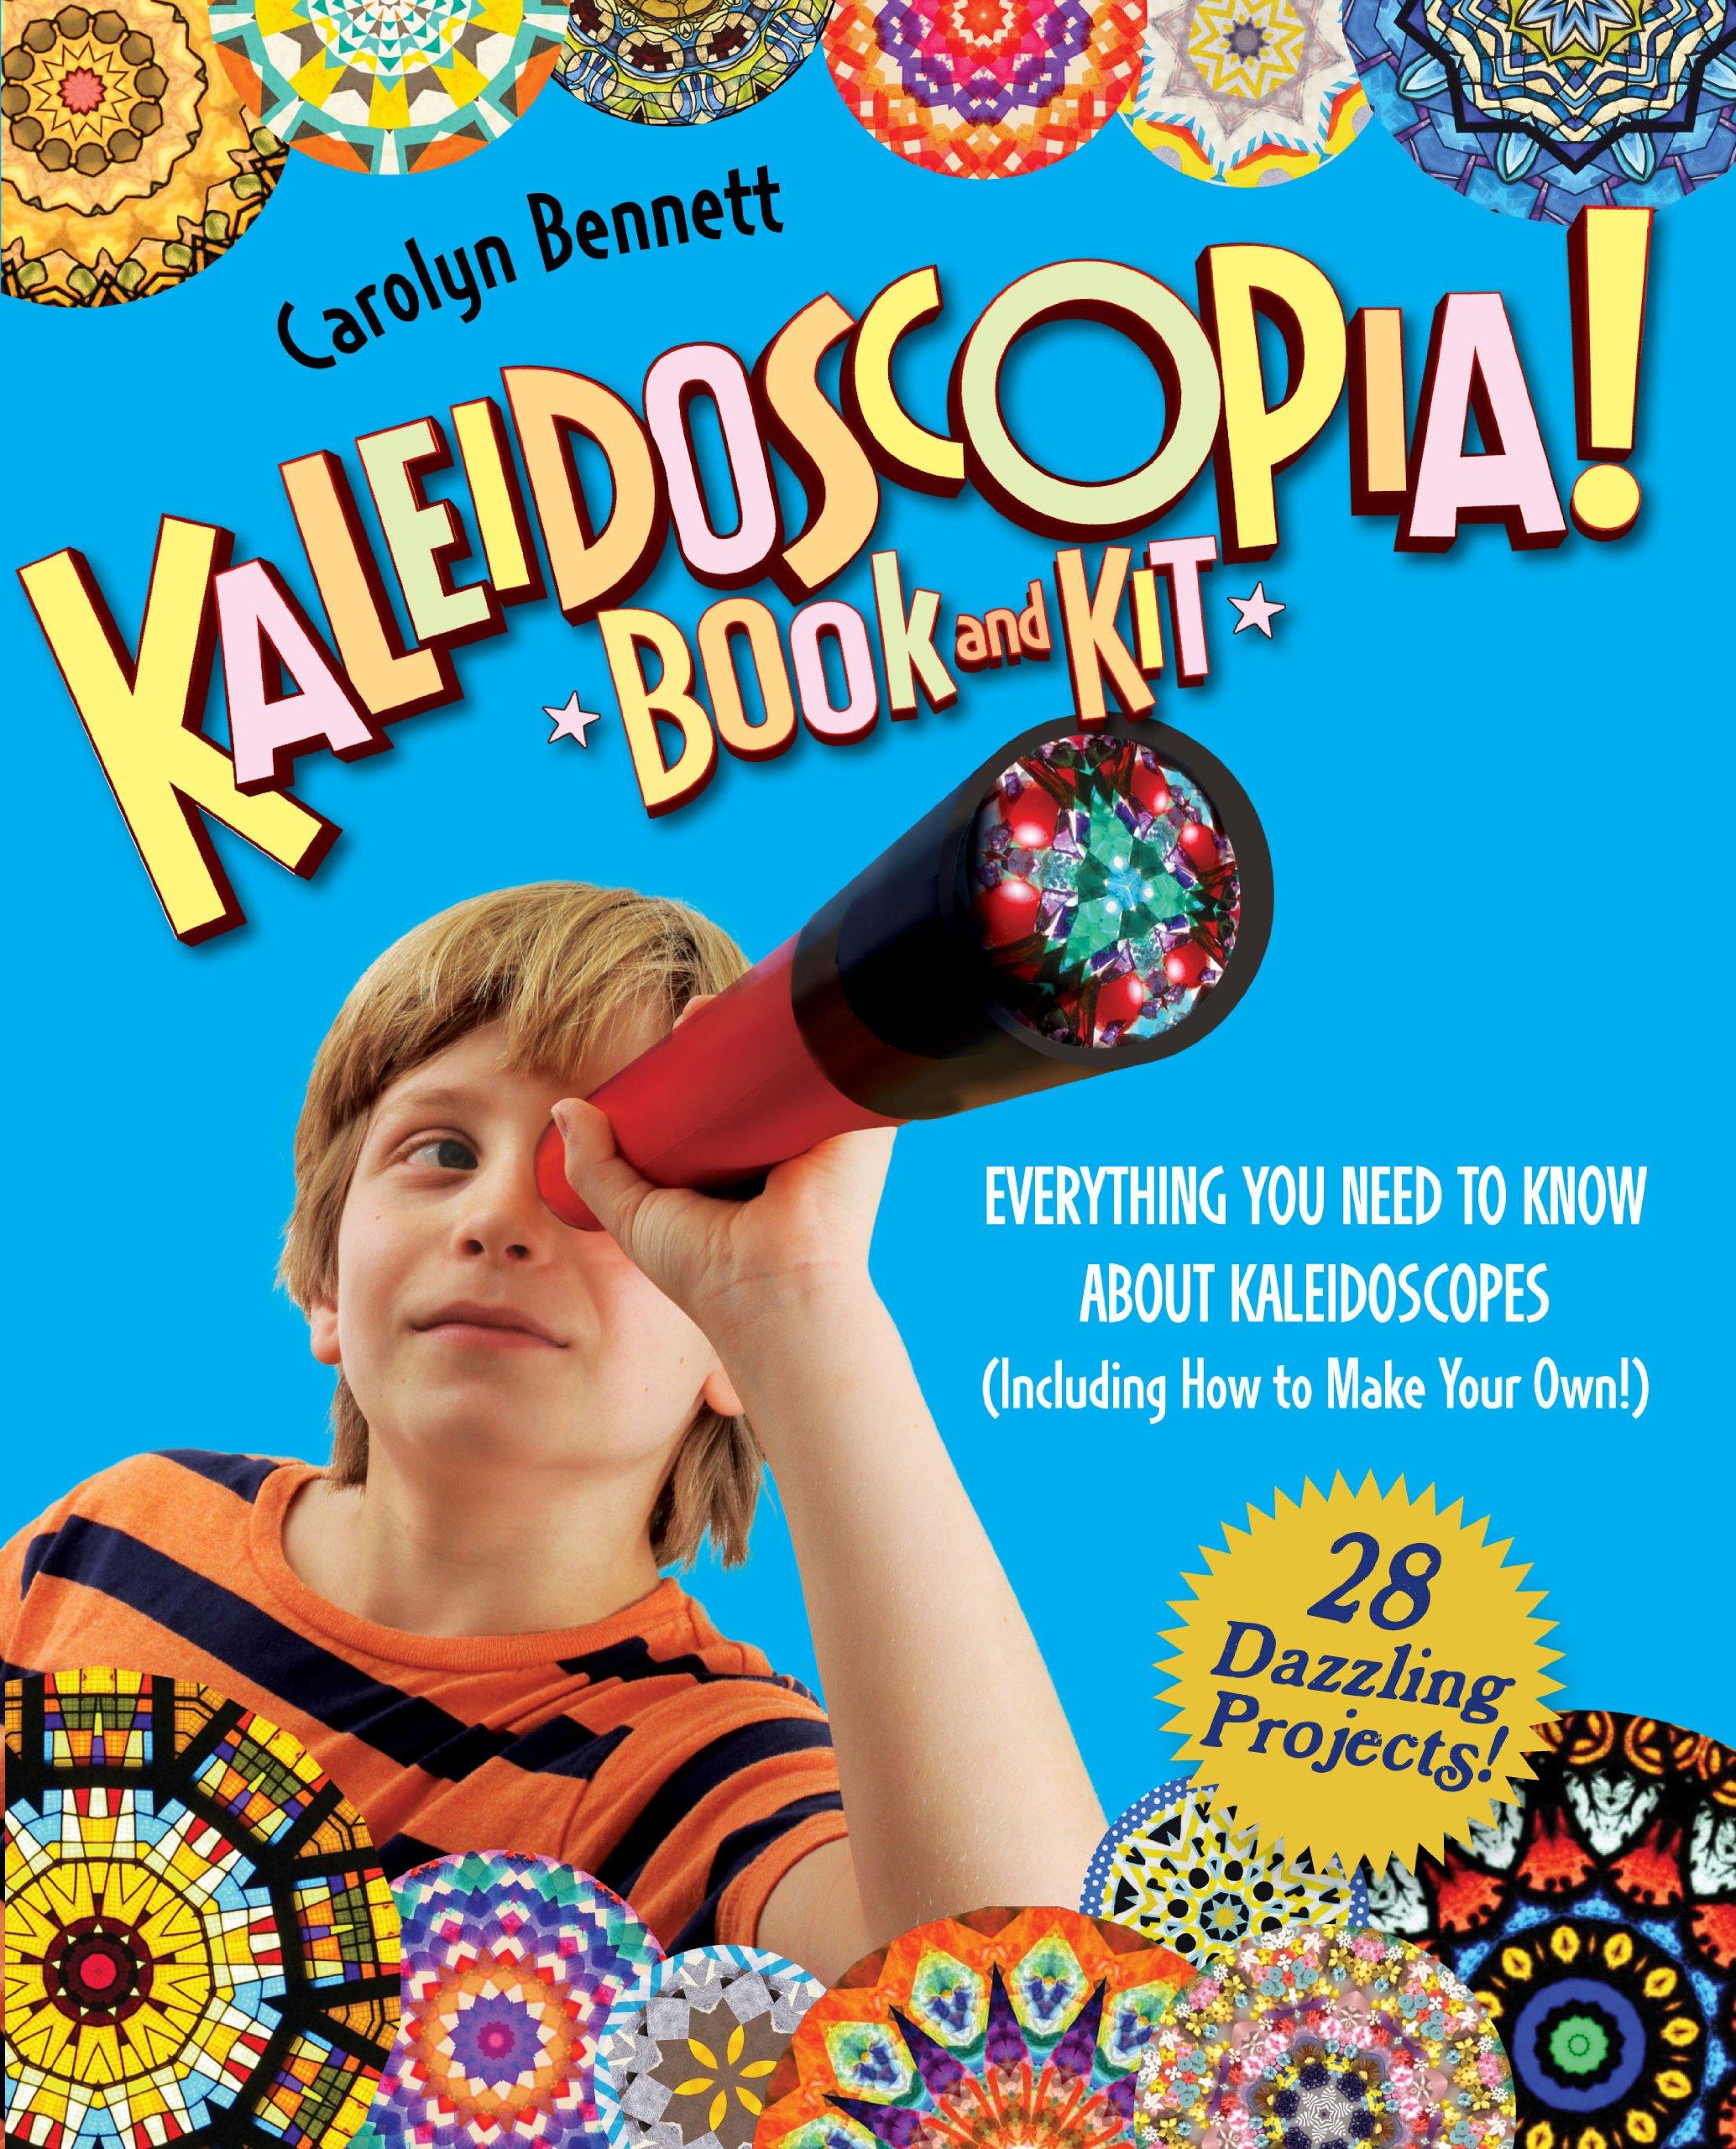 Kaleidoscopia Book Kit Everything Kaleidoscopes product image